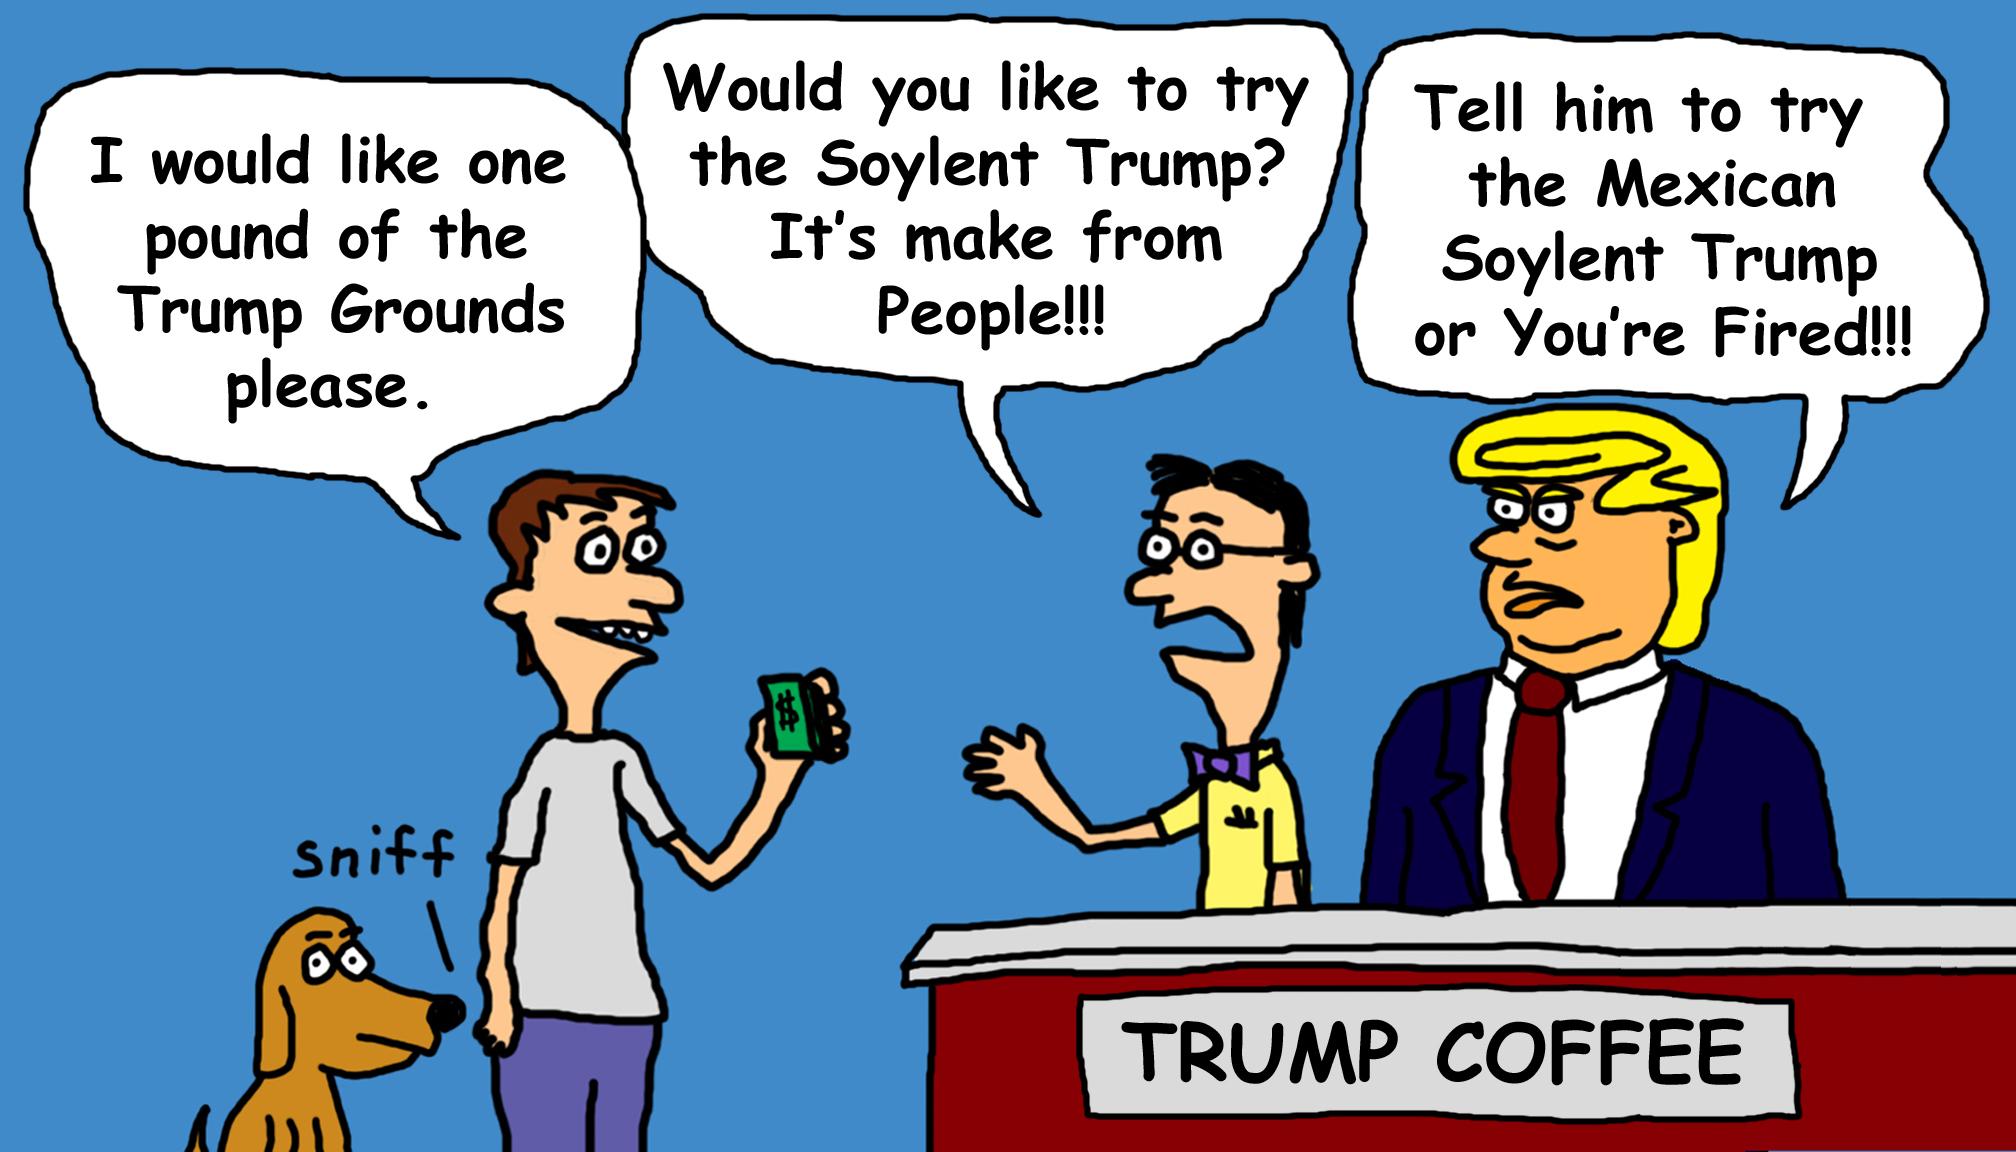 Trump Grounds